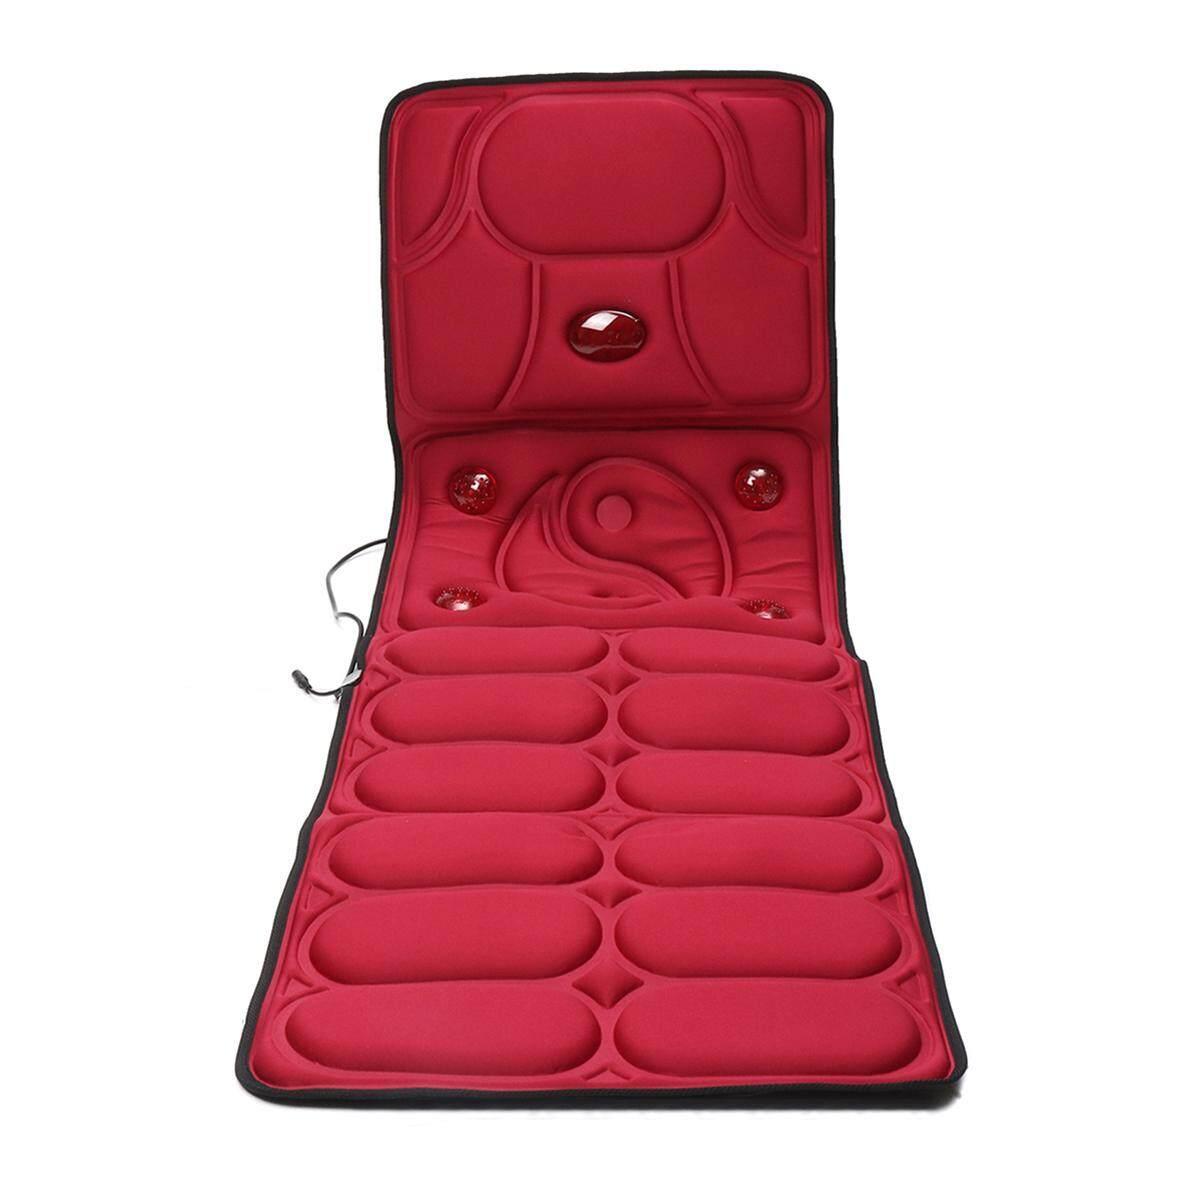 Pad Cushion Mat Comfy Home Car Chair Multi-Function Vibration Massage Mattress